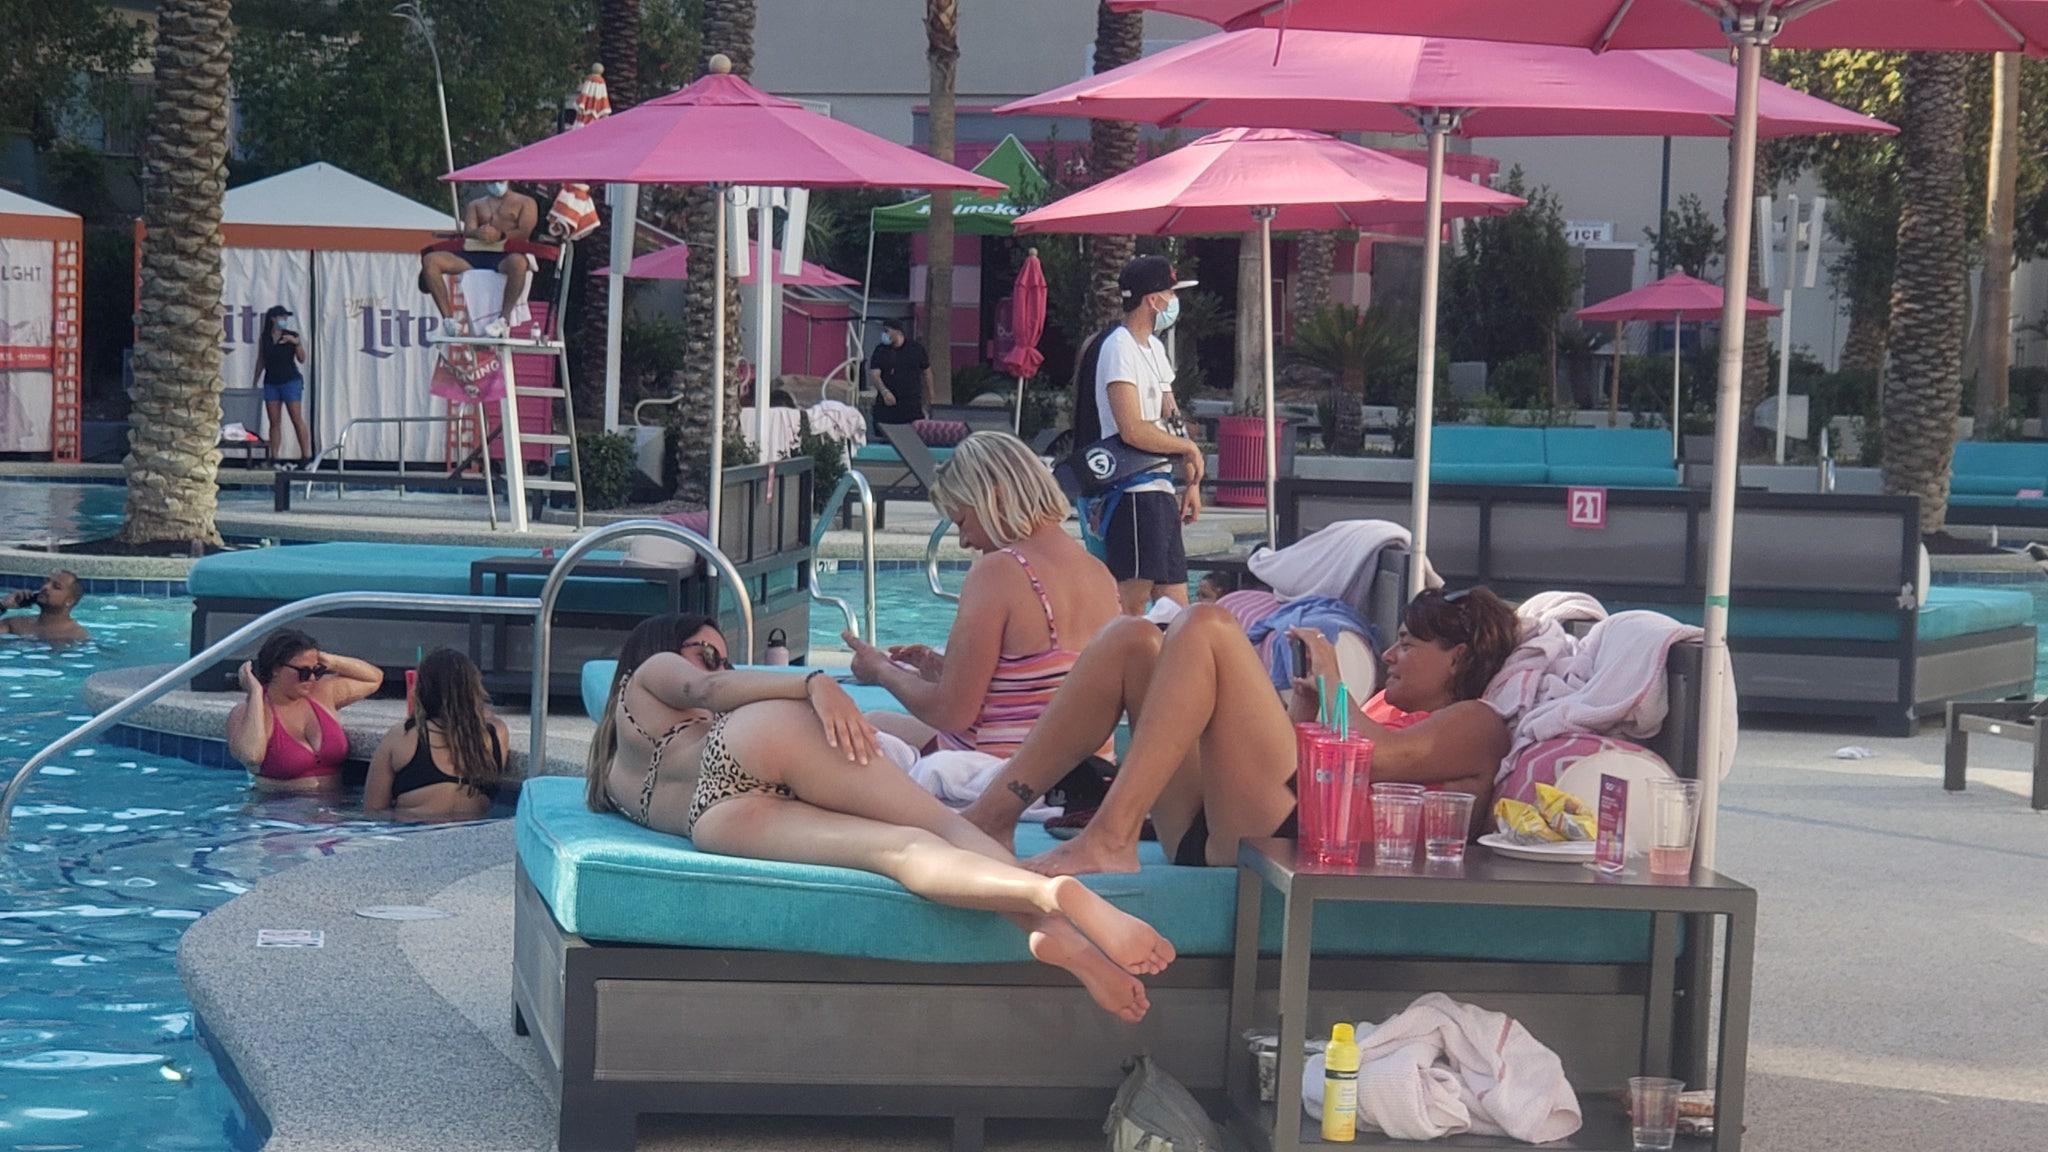 Las Vegas Reopening First Pool Party at Flamingo Face Masks & Bikinis All Around!!!